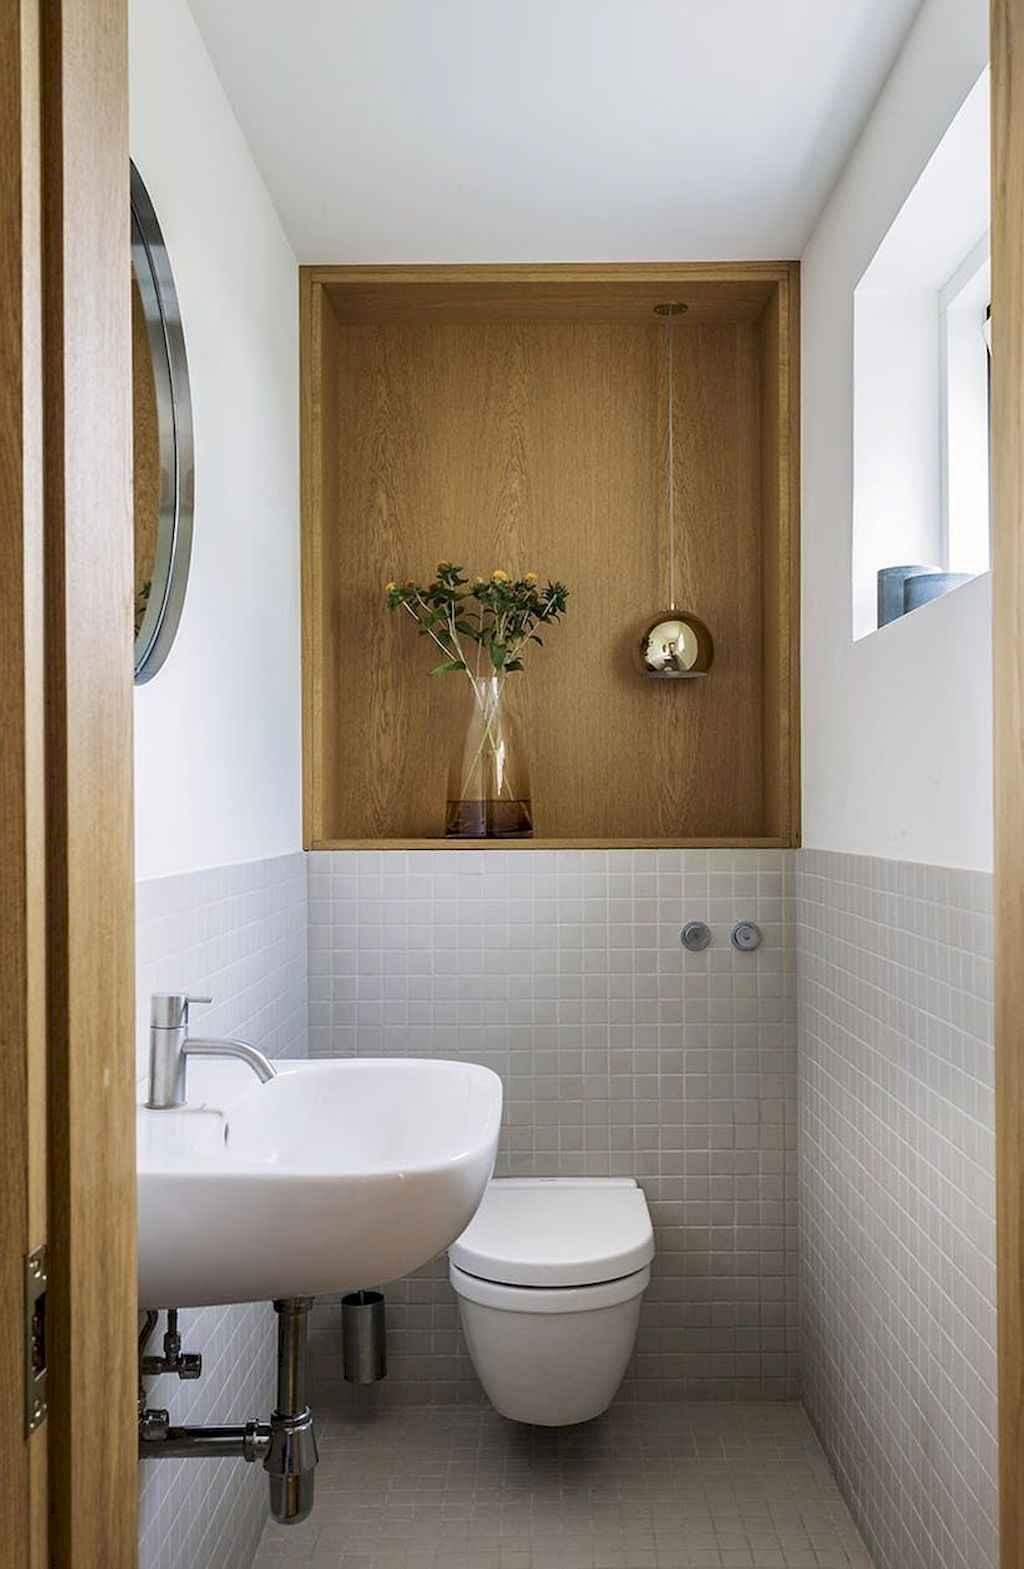 111 Brilliant Small Bathroom Remodel Ideas On A Budget (53)